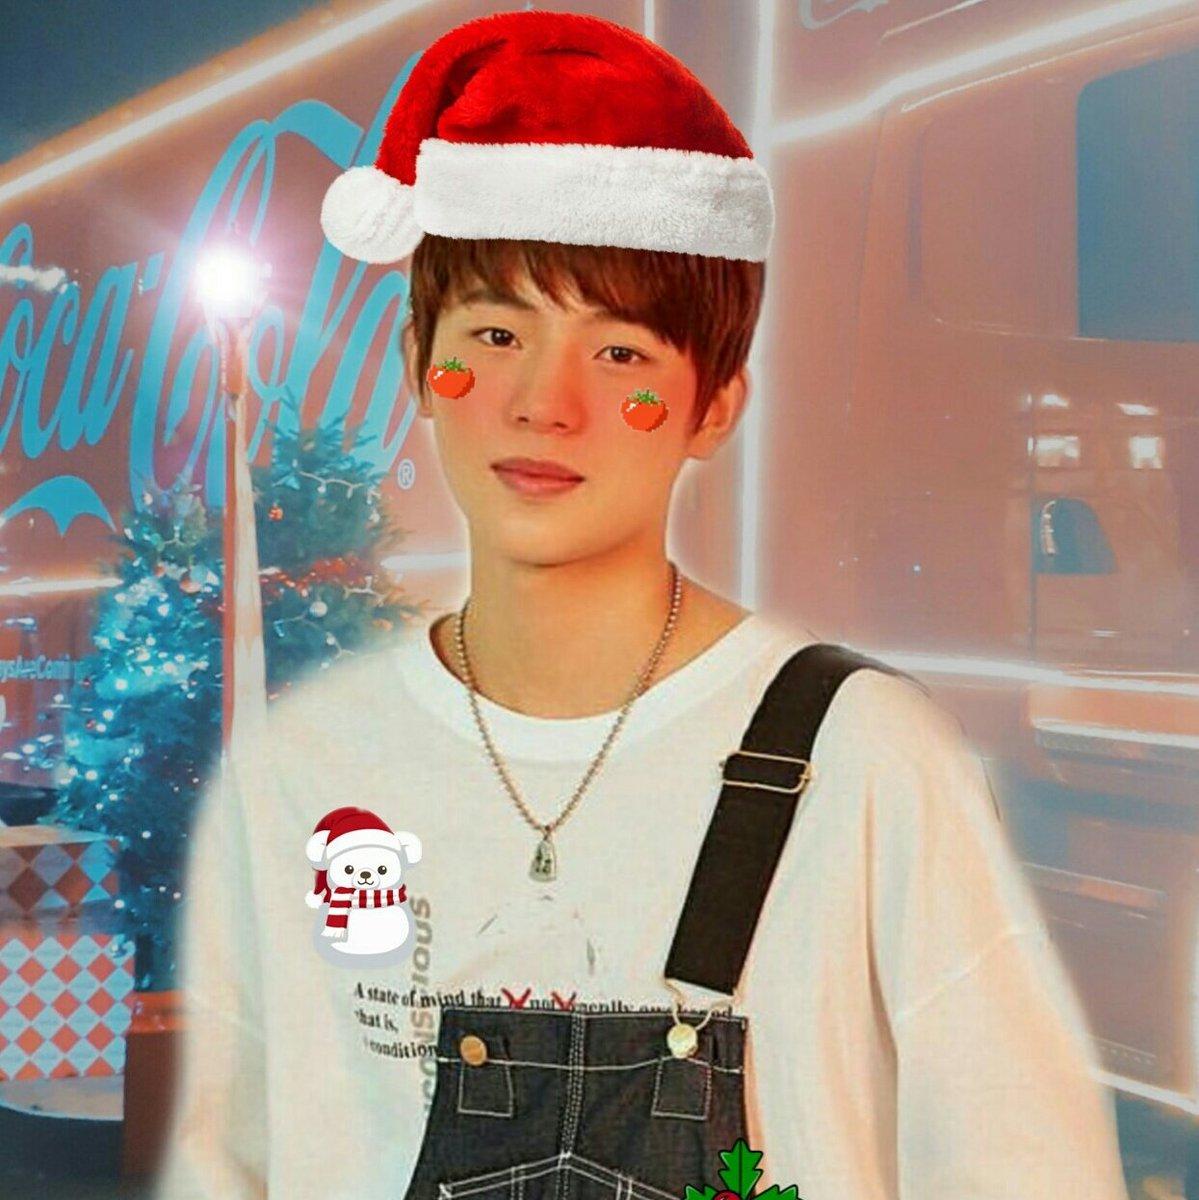 () » Holidays layout!¡  #SungYeon #KimSungyeon #김성연 #프로듀스X101 #PRODUCE_X_101 #PRODUCEX101<br>http://pic.twitter.com/zEOI3SGRid